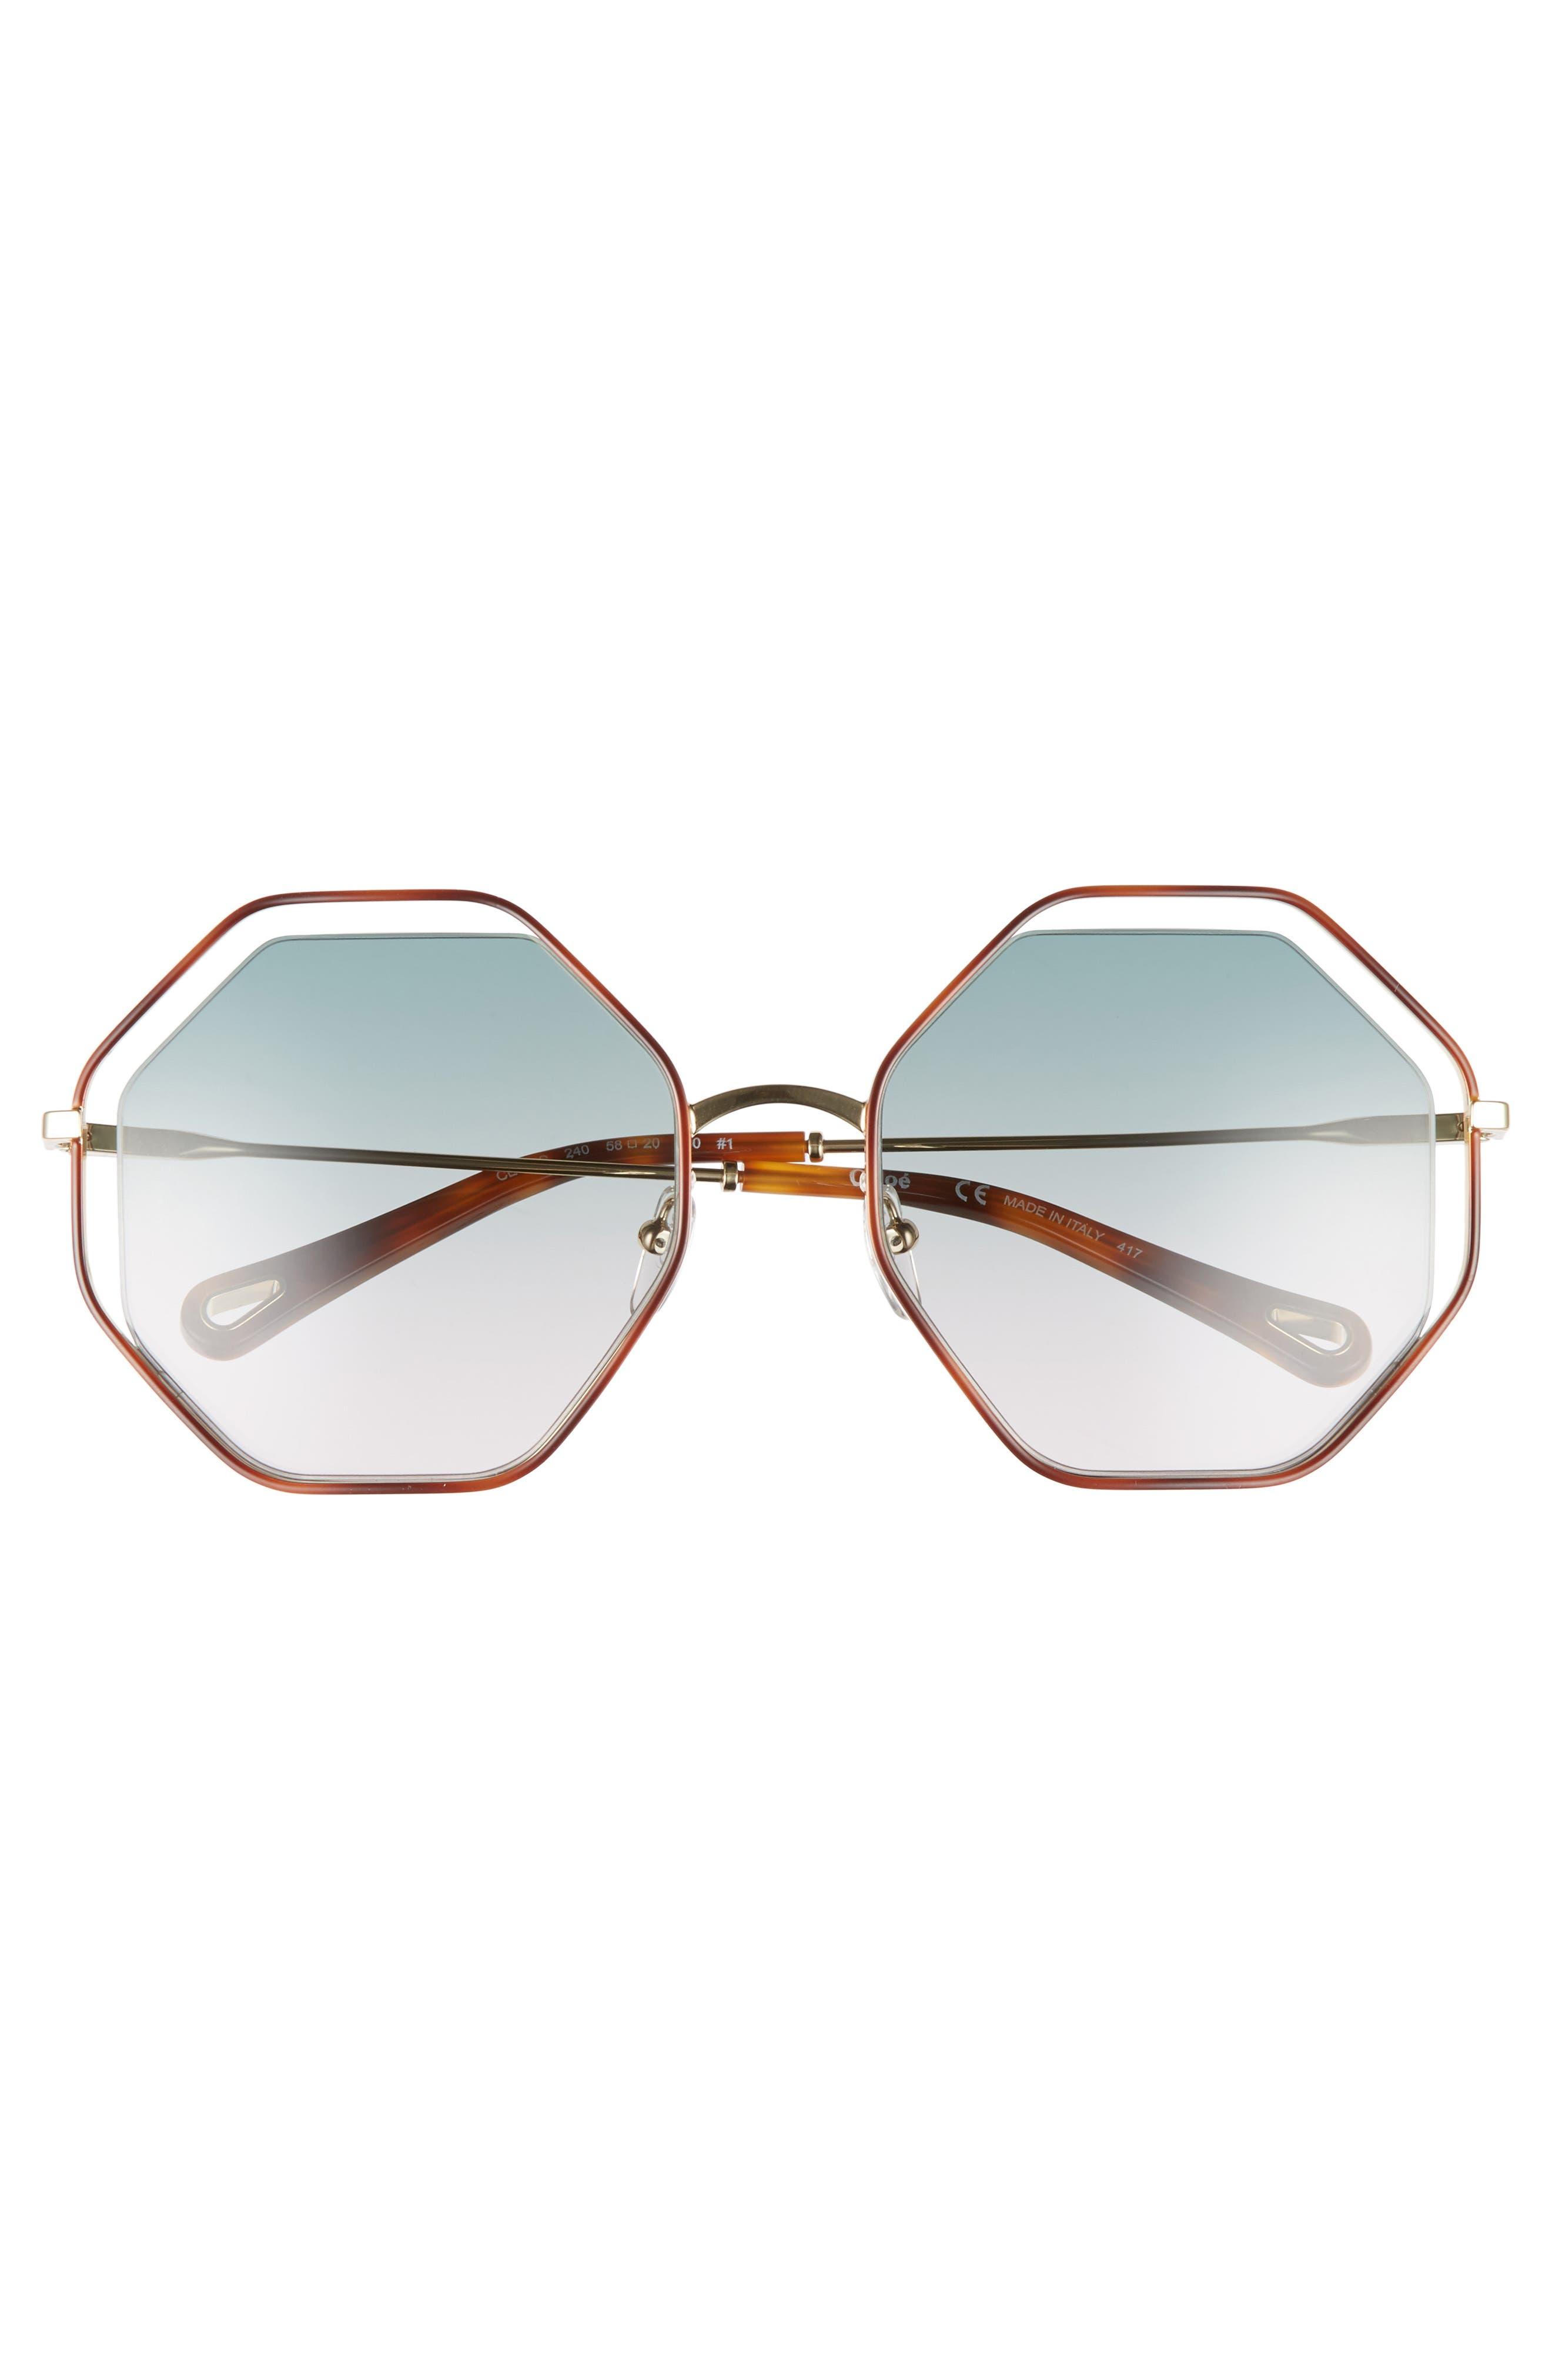 58mm Octagonal Halo Lens Sunglasses,                             Alternate thumbnail 3, color,                             Havana/ Green Rose